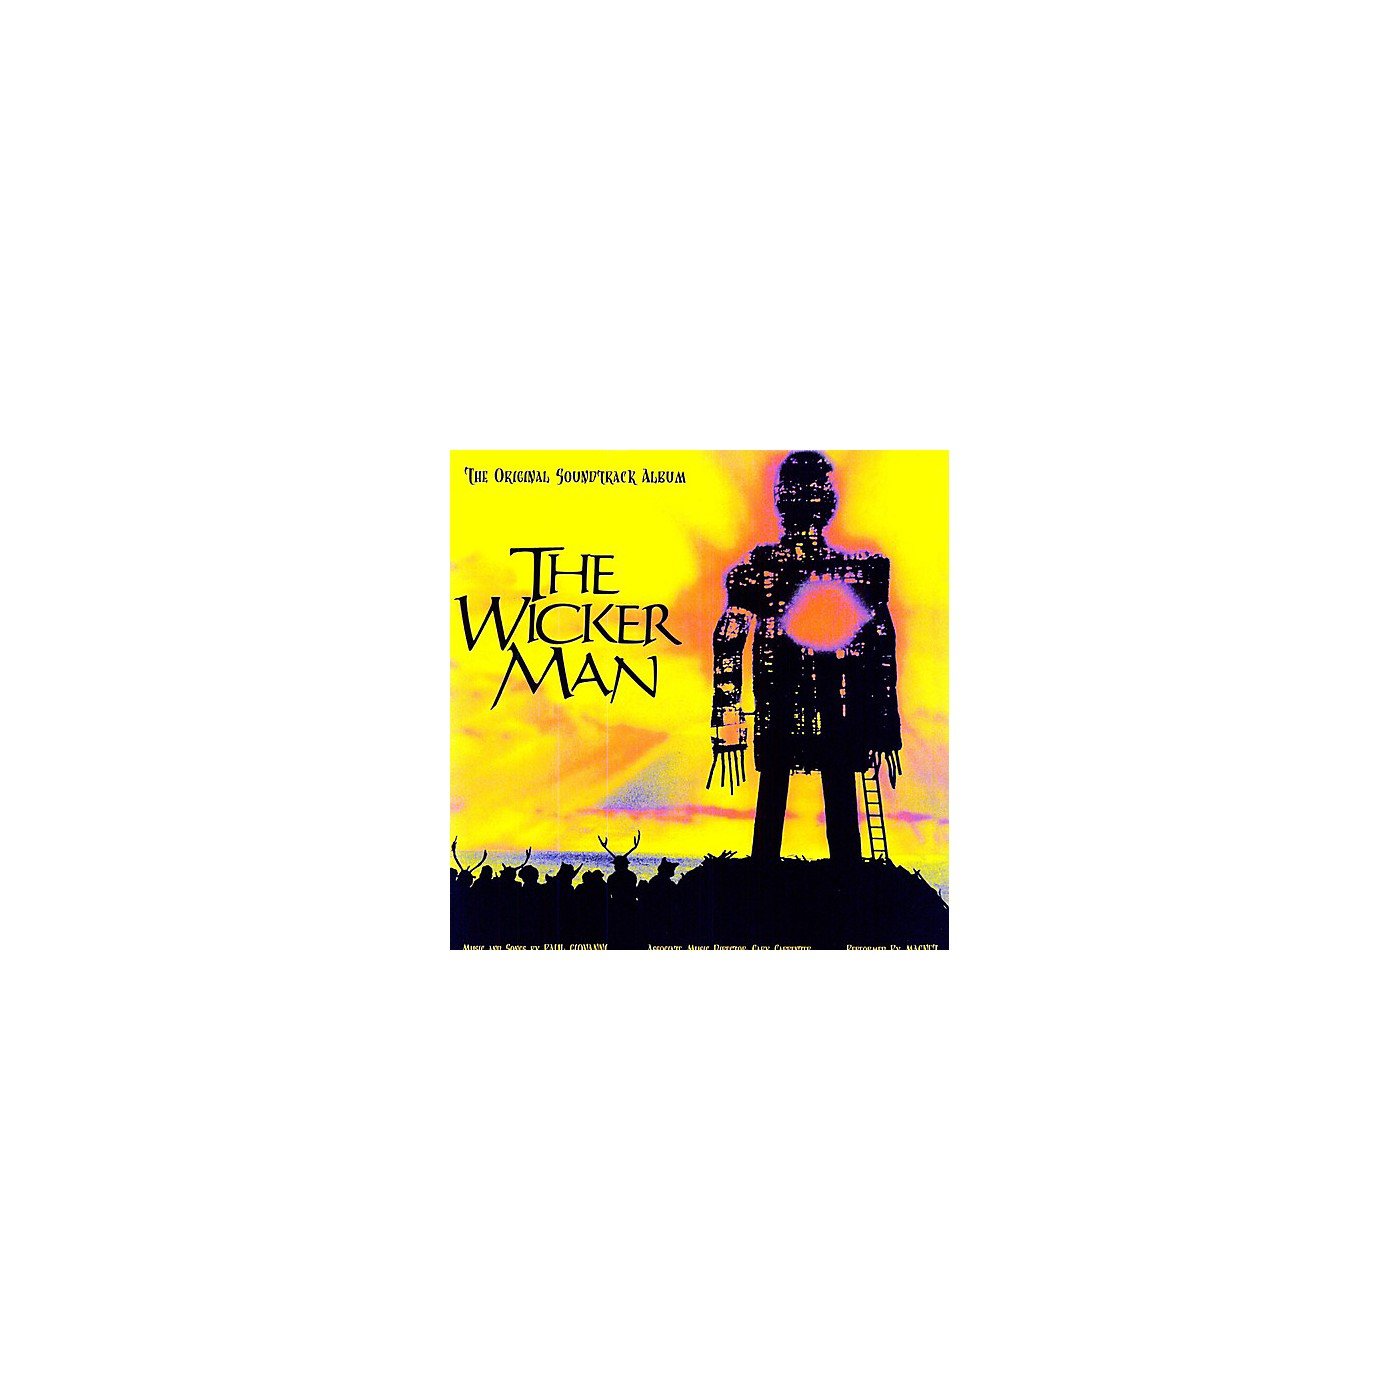 Alliance Paul Giovanni - The Wicker Man (The Original Soundtrack Album) thumbnail